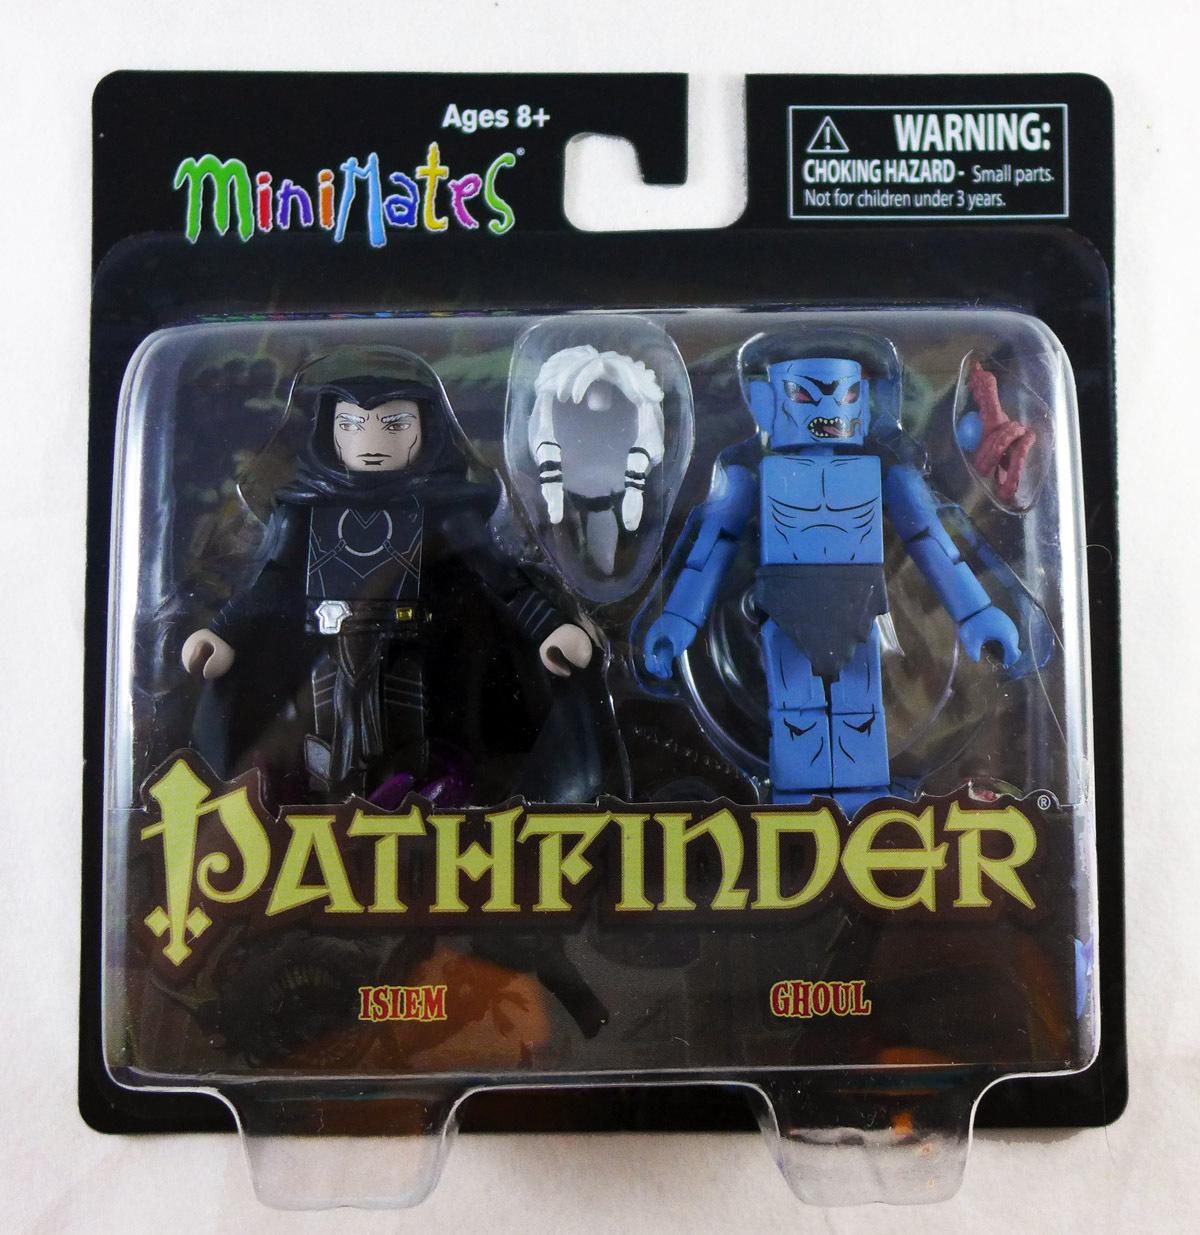 GenCon Exclusive Isiem & Ghoul Pathfinder Minimates